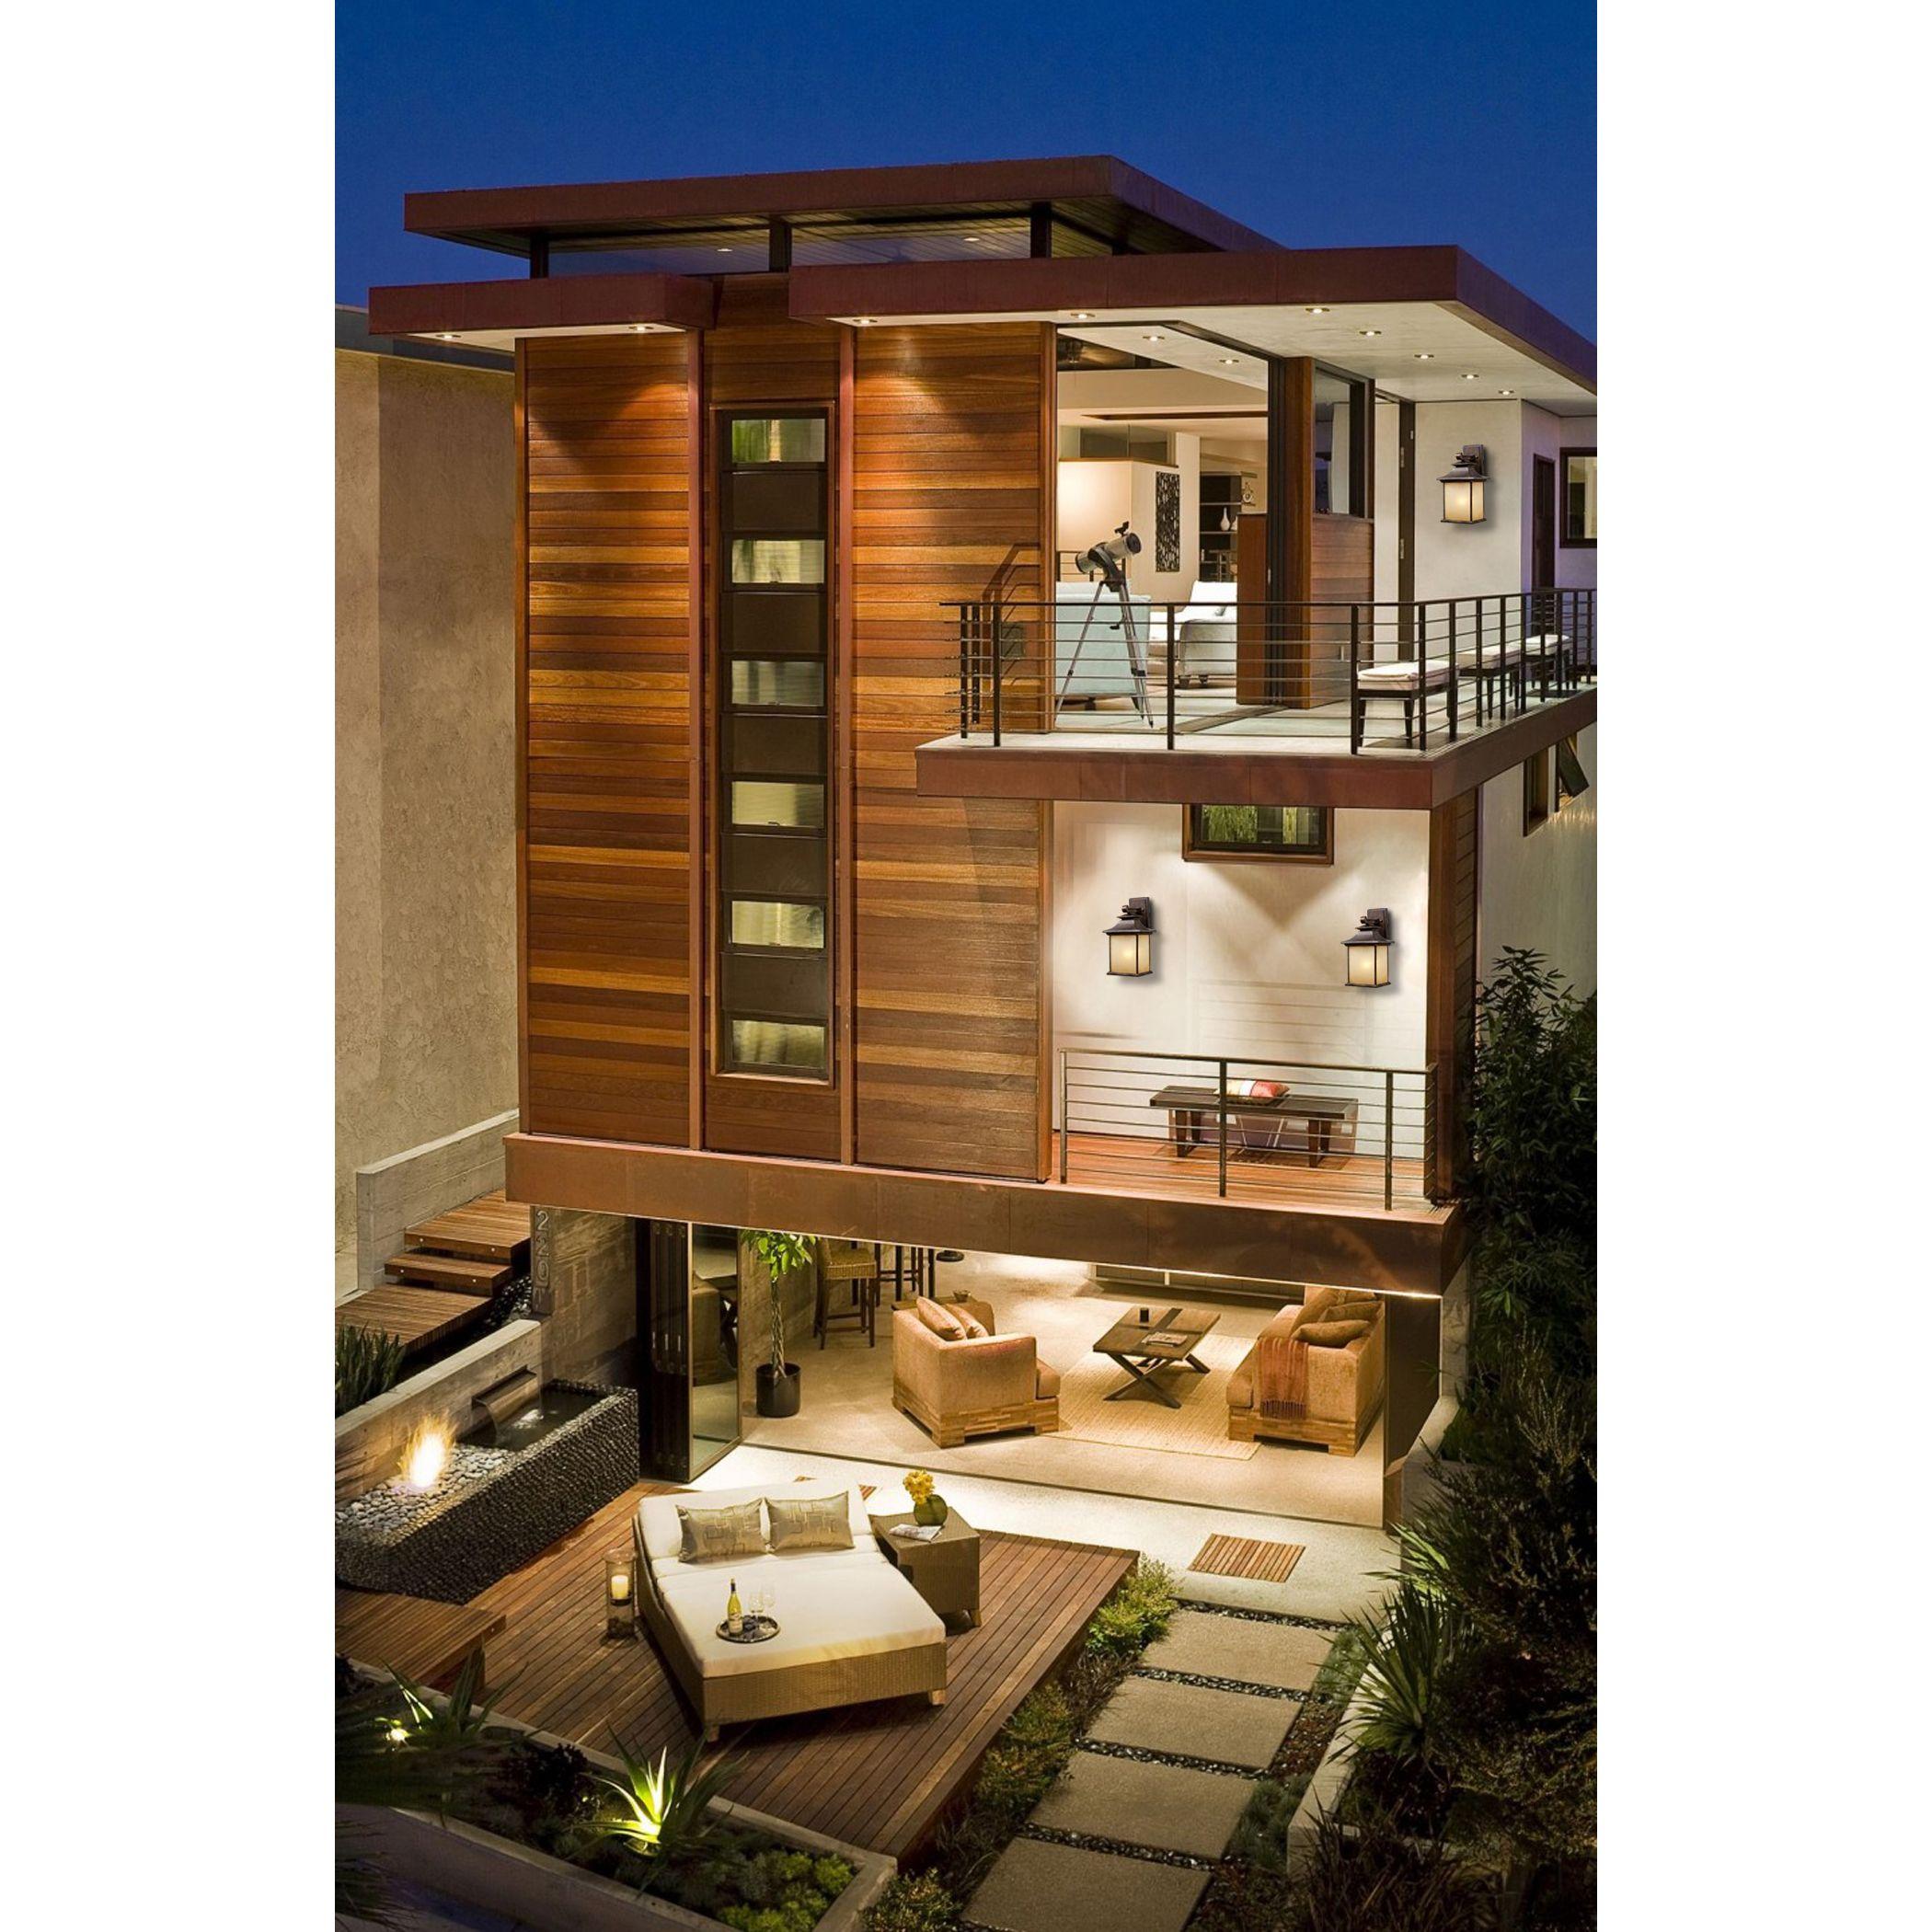 Steve Lazar has designed this luxurious contemporary